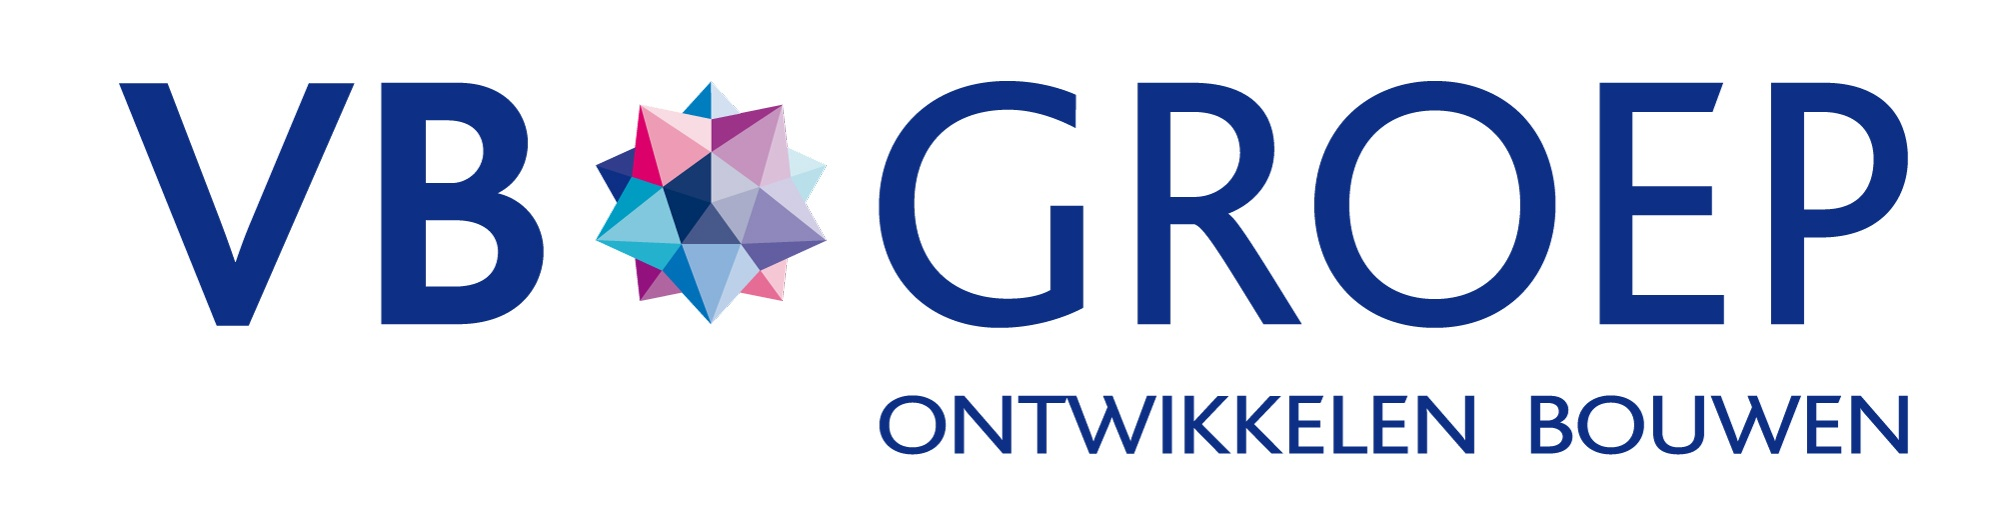 VB-Groep-logo-FC_ontw_bouw.jpg